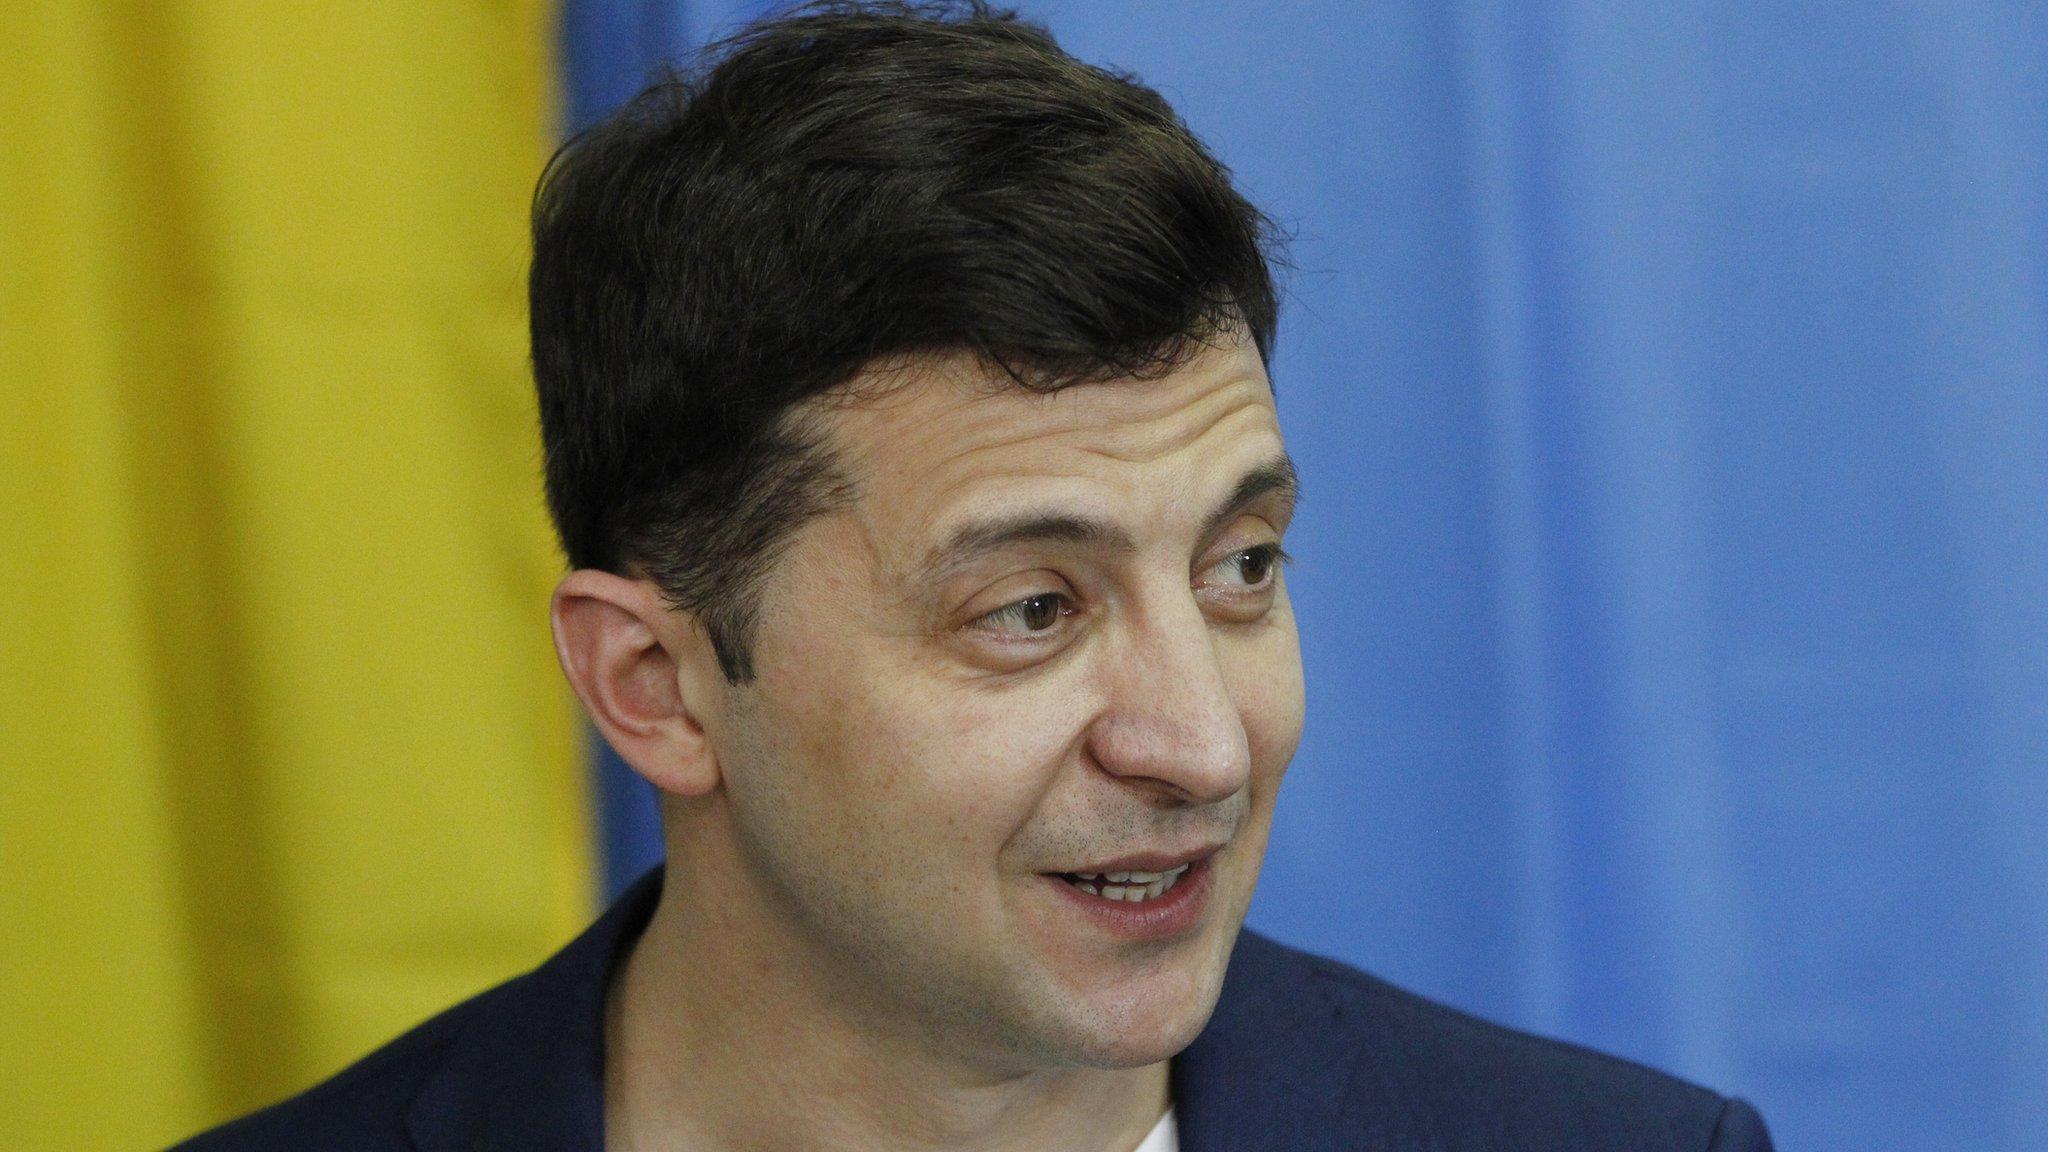 Ukraine election: Comedian Zelensky 'wins presidency by landslide'